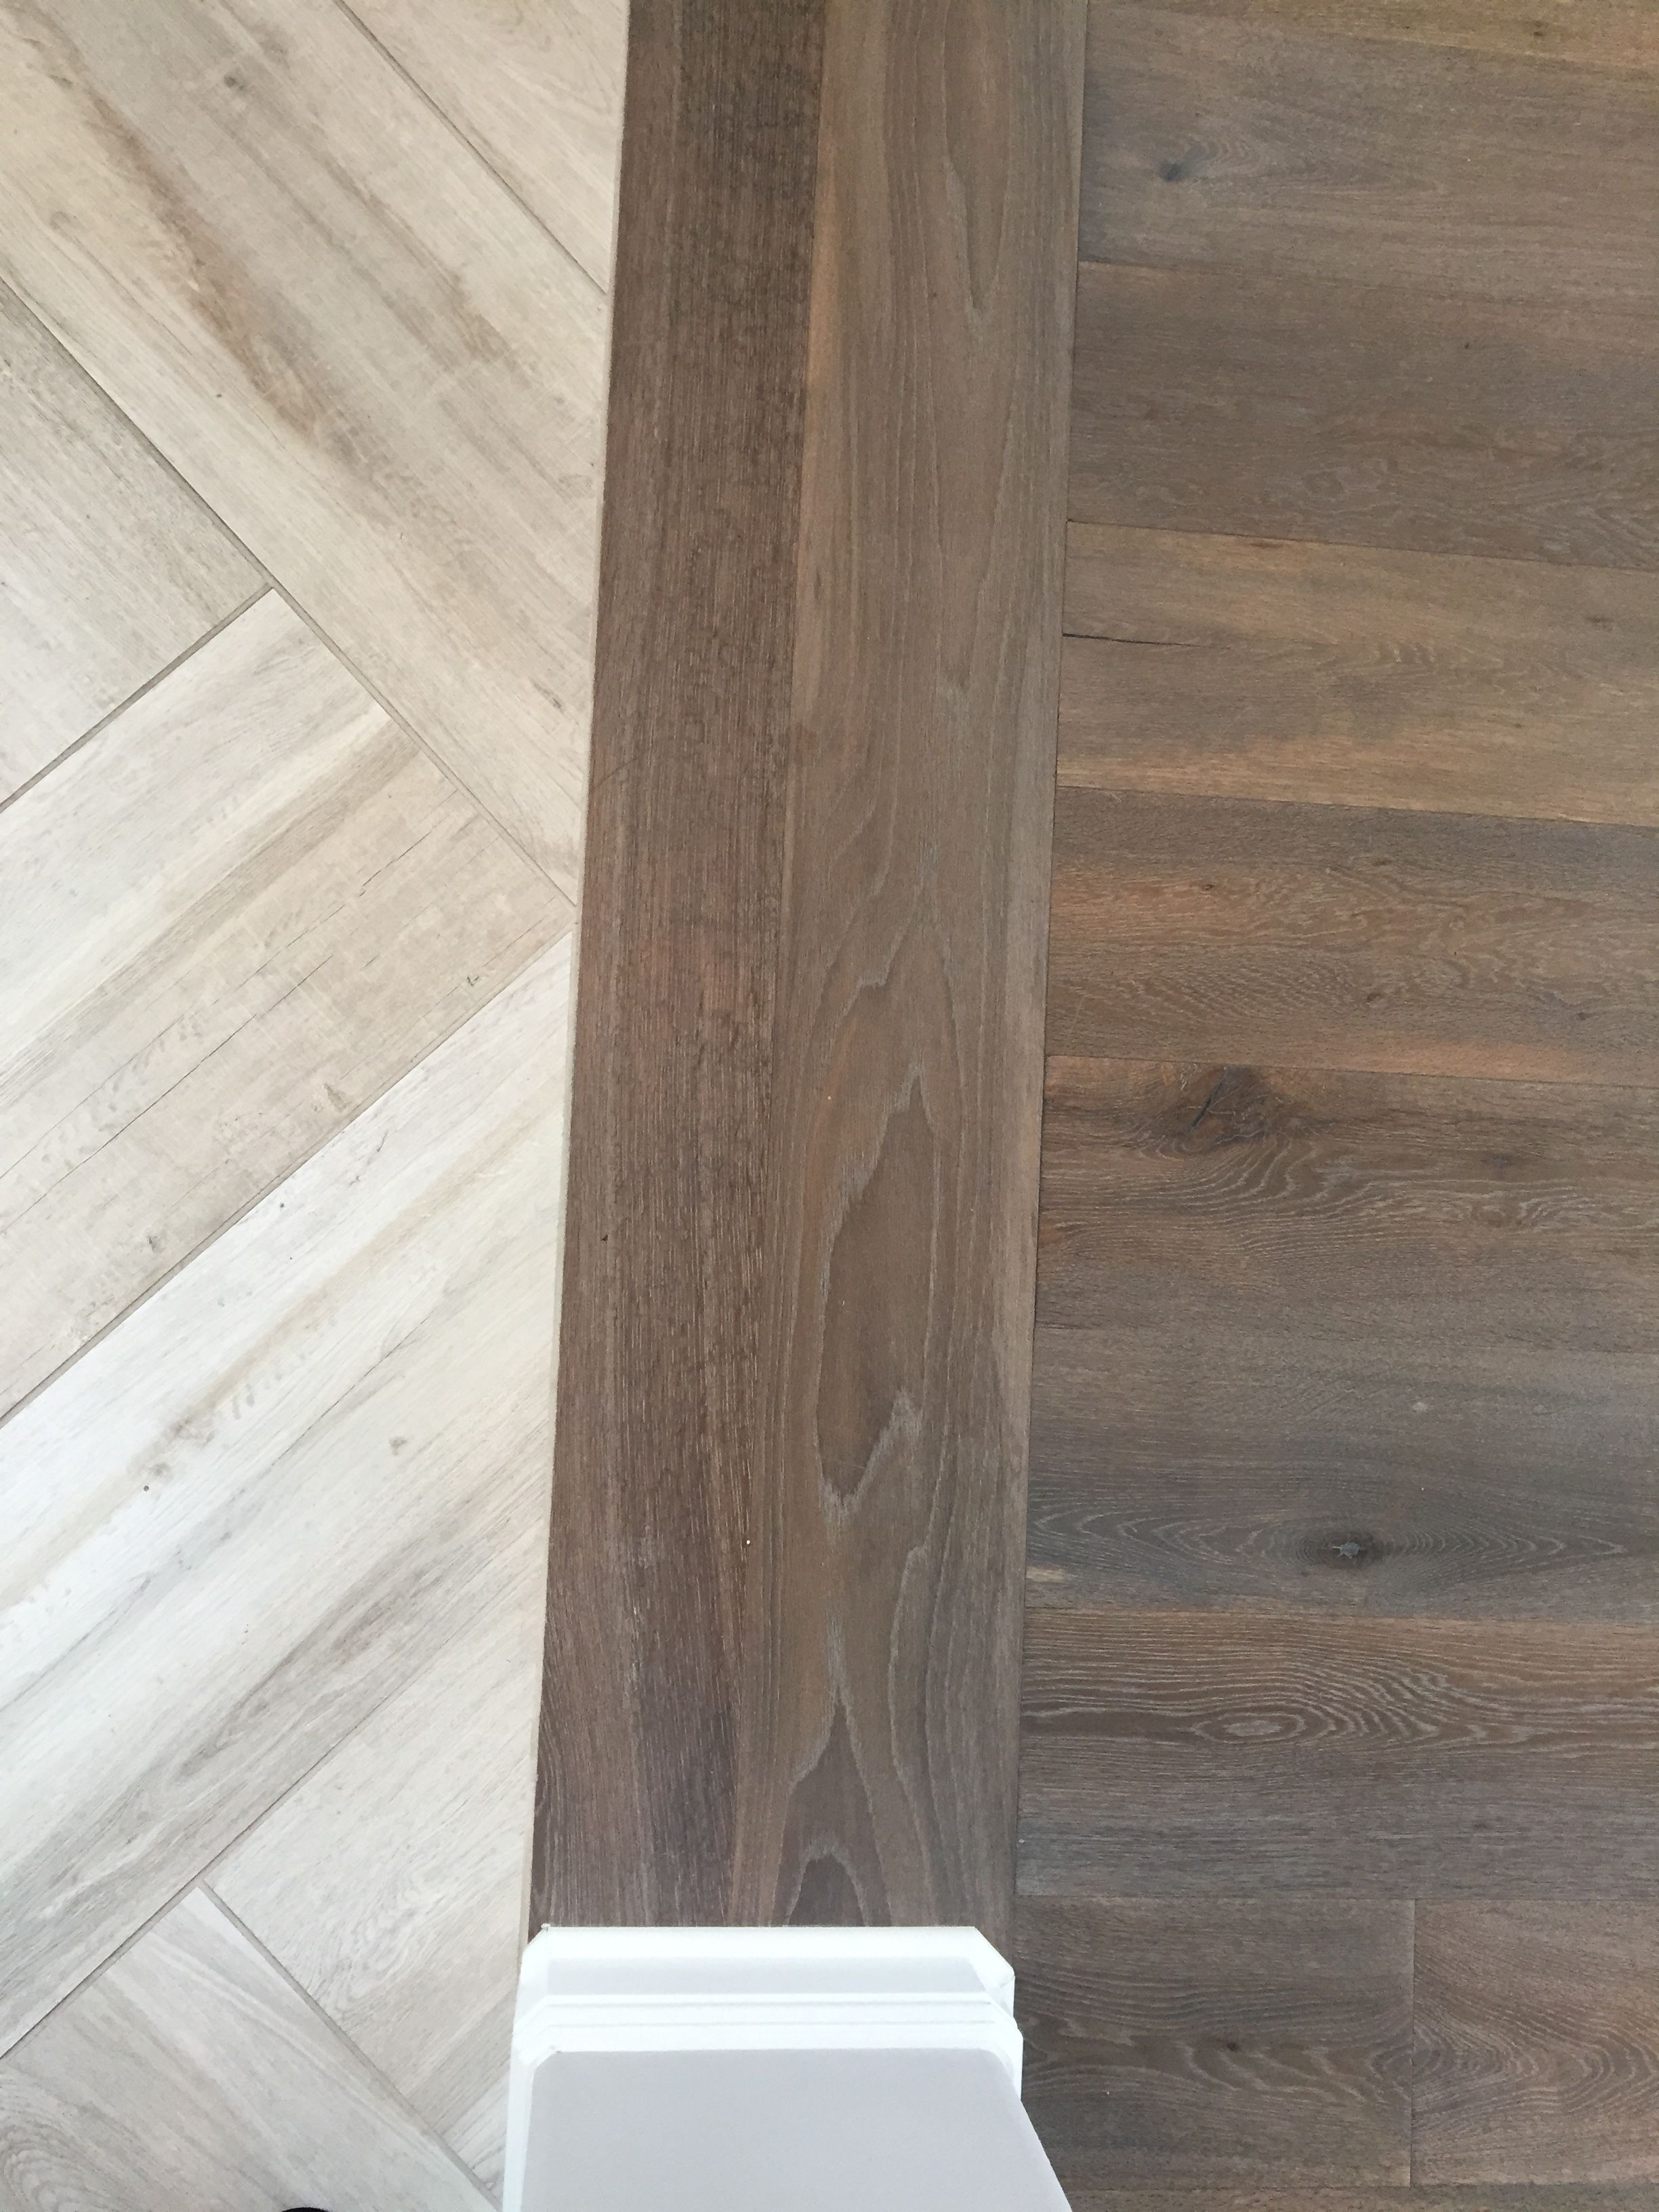 honey maple hardwood flooring of floor transition laminate to herringbone tile pattern model in floor transition laminate to herringbone tile pattern herringbone tile pattern herringbone wood floor